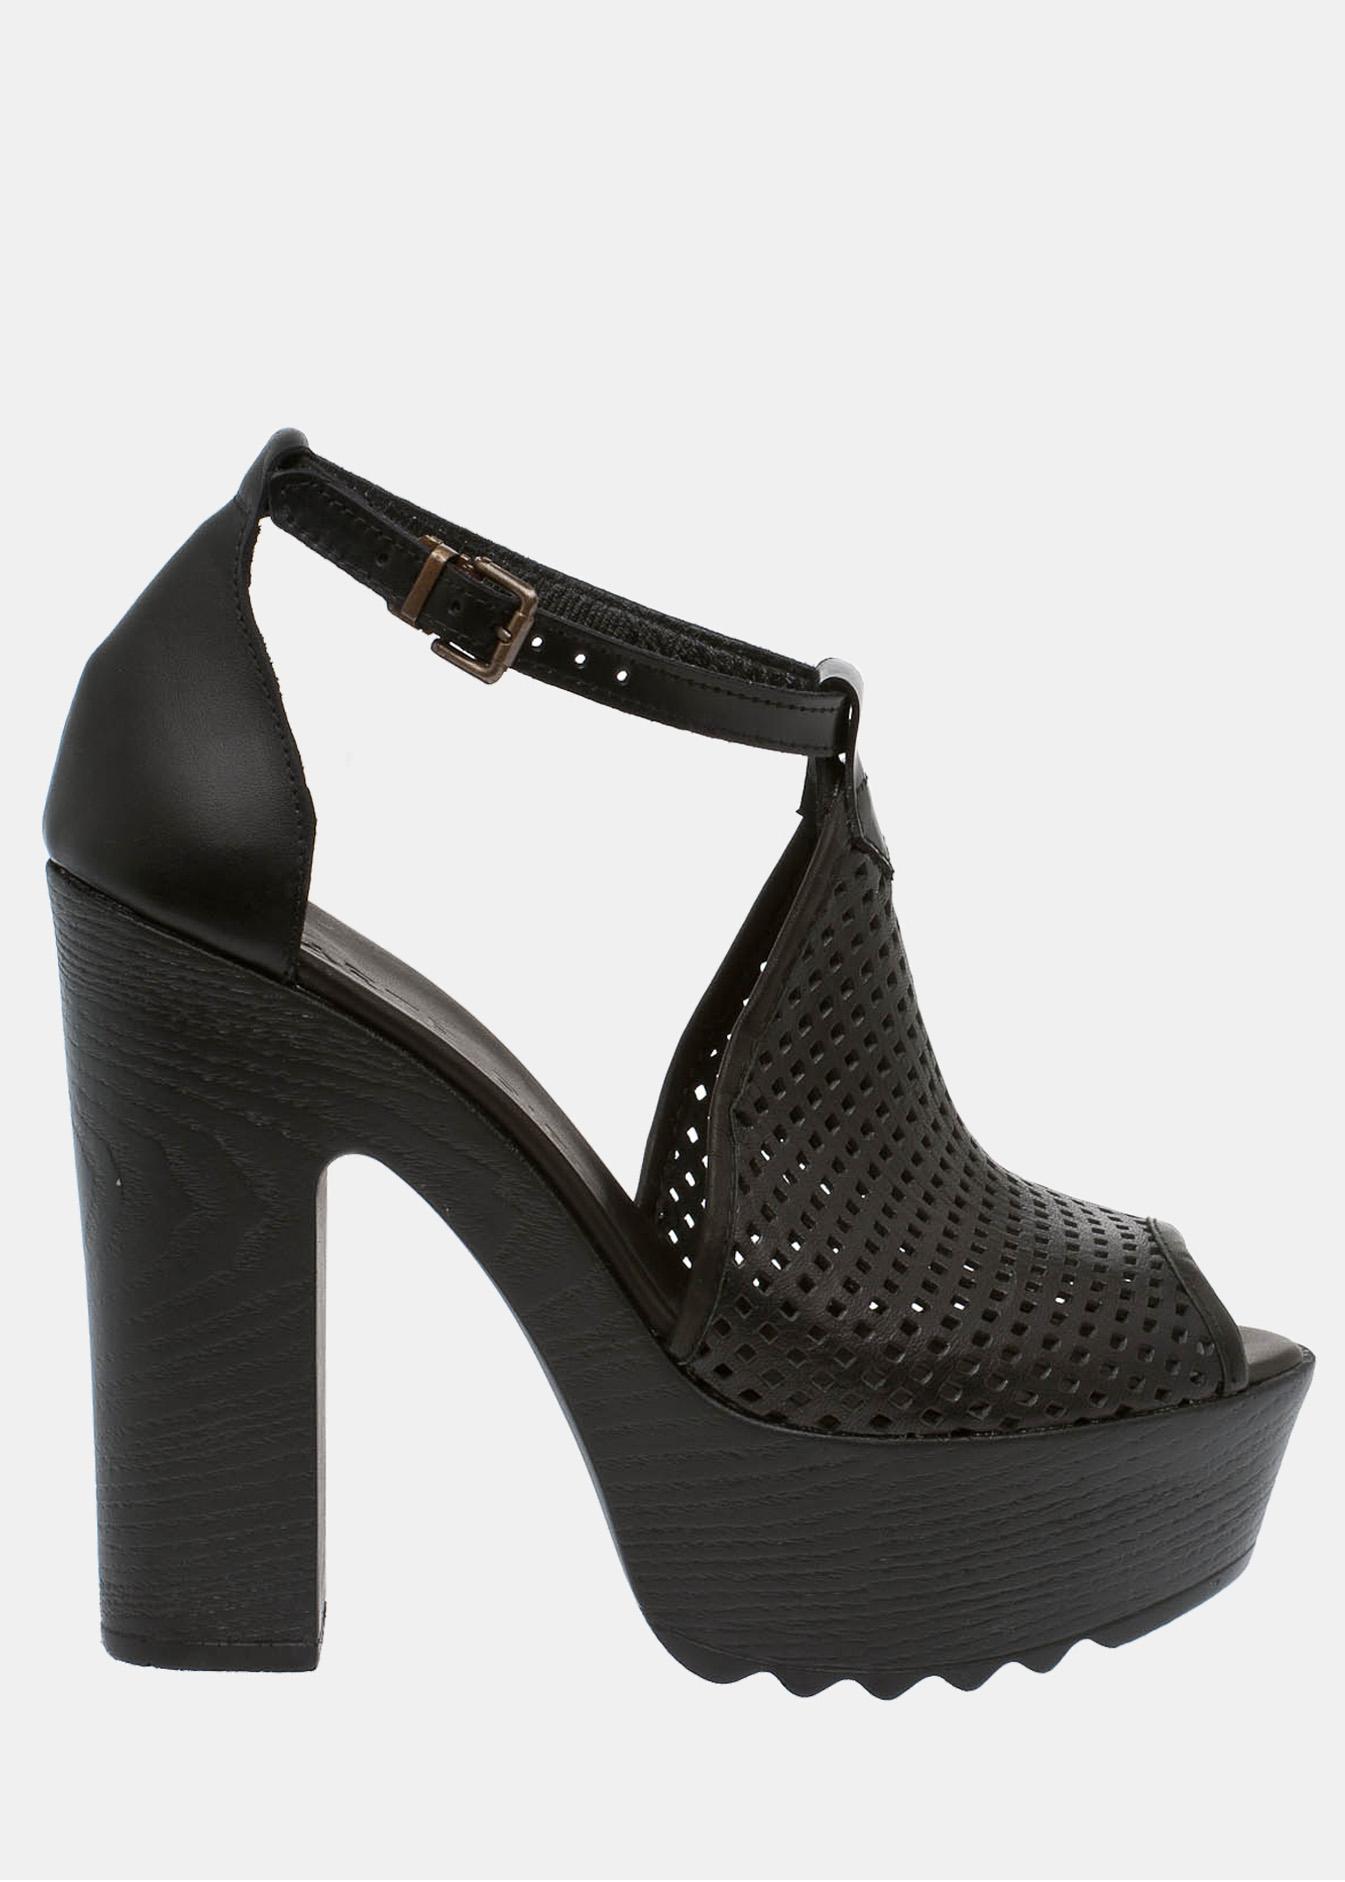 Kendall δερμάτινο πέδιλο, μαύρο παπούτσια